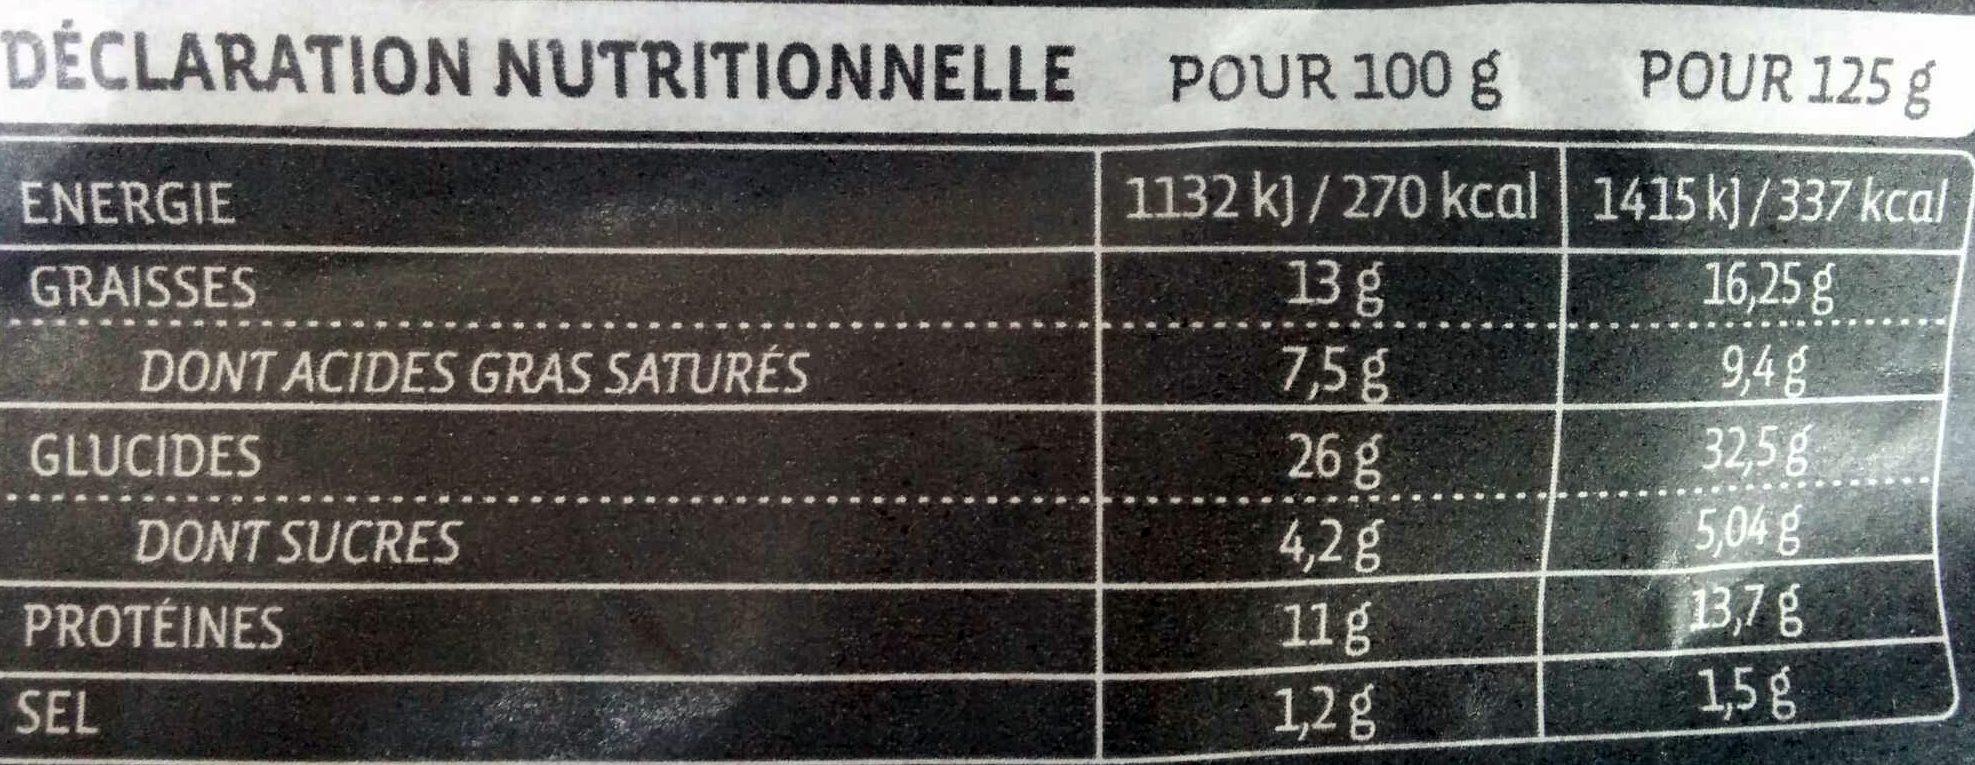 Gourmet Grand Ravioli Chèvre Fines Herbes - Voedigswaarden